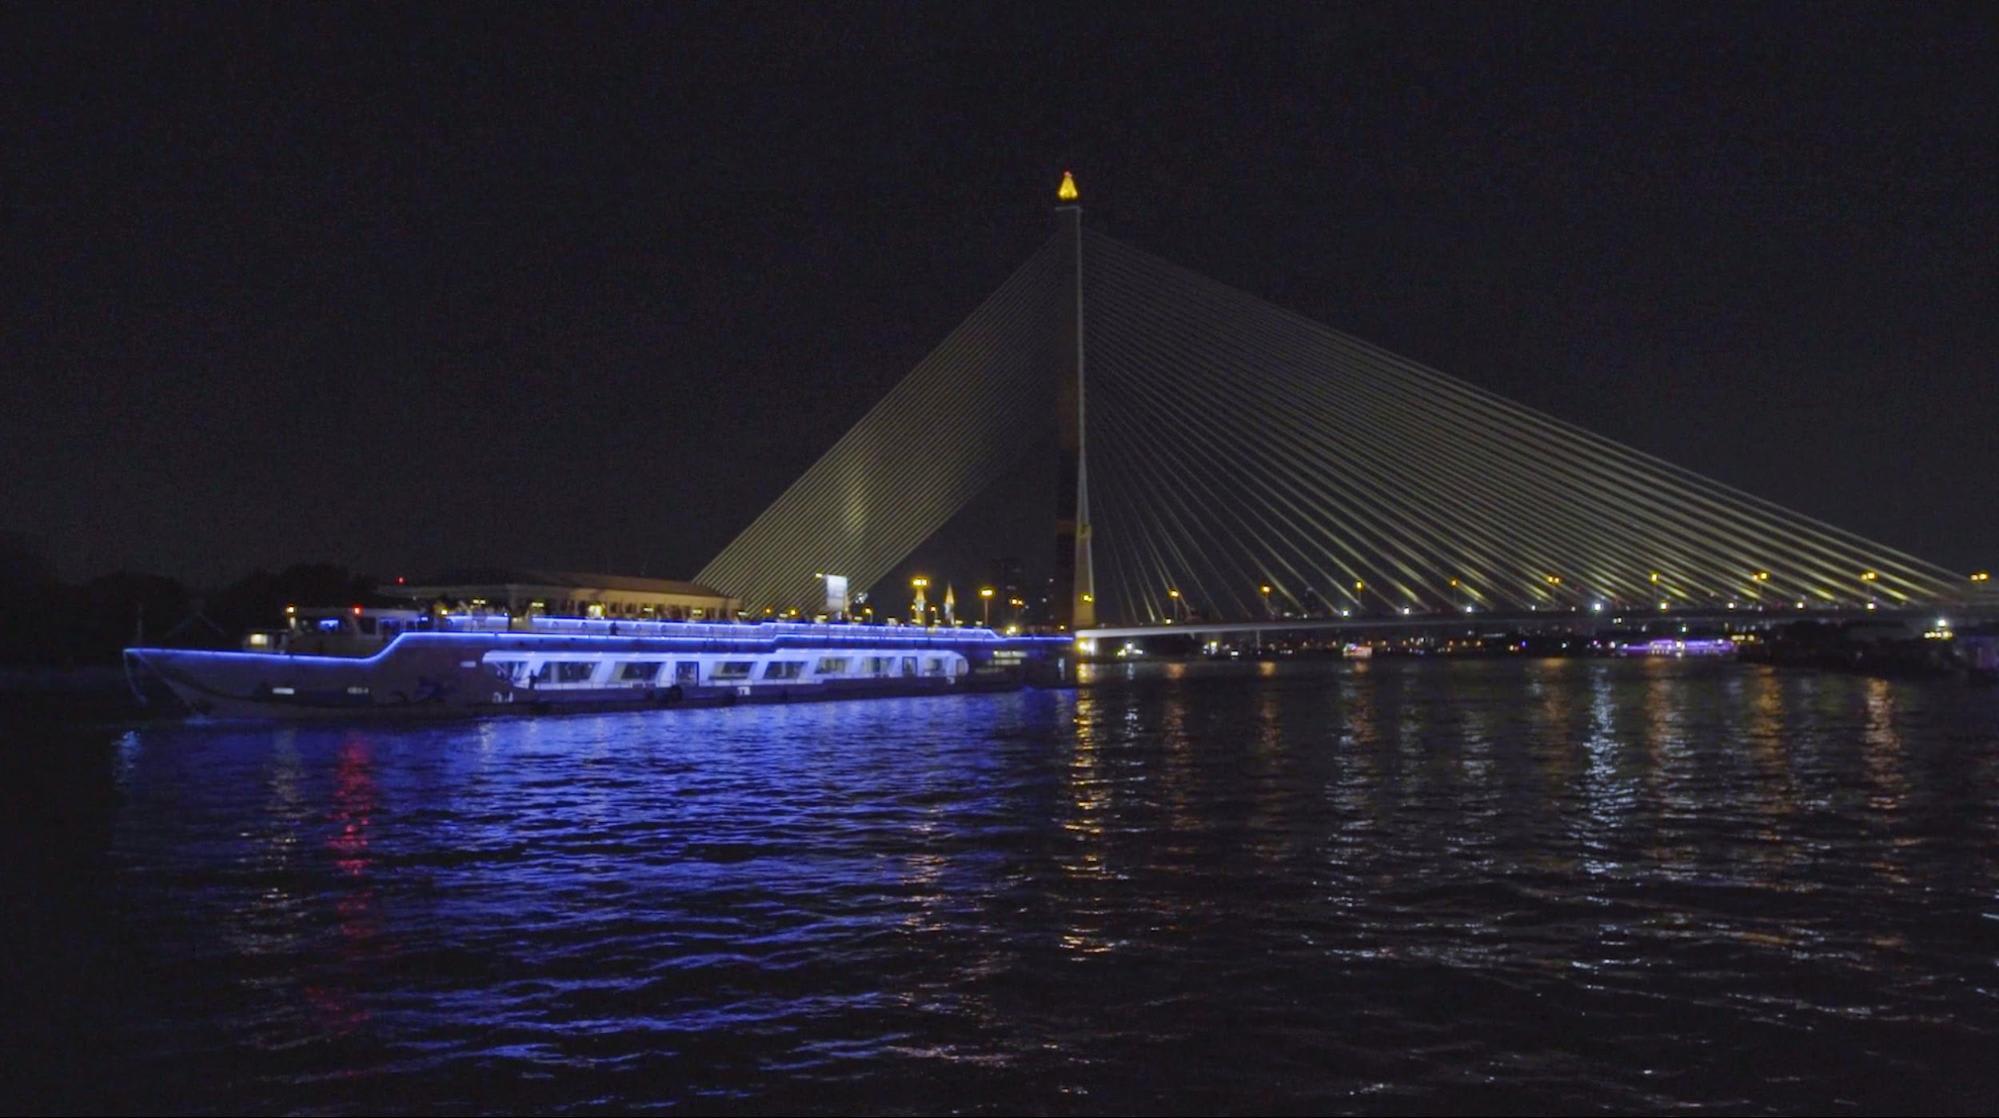 SAM YG Bangkok Chao Phraya Princess Cruise